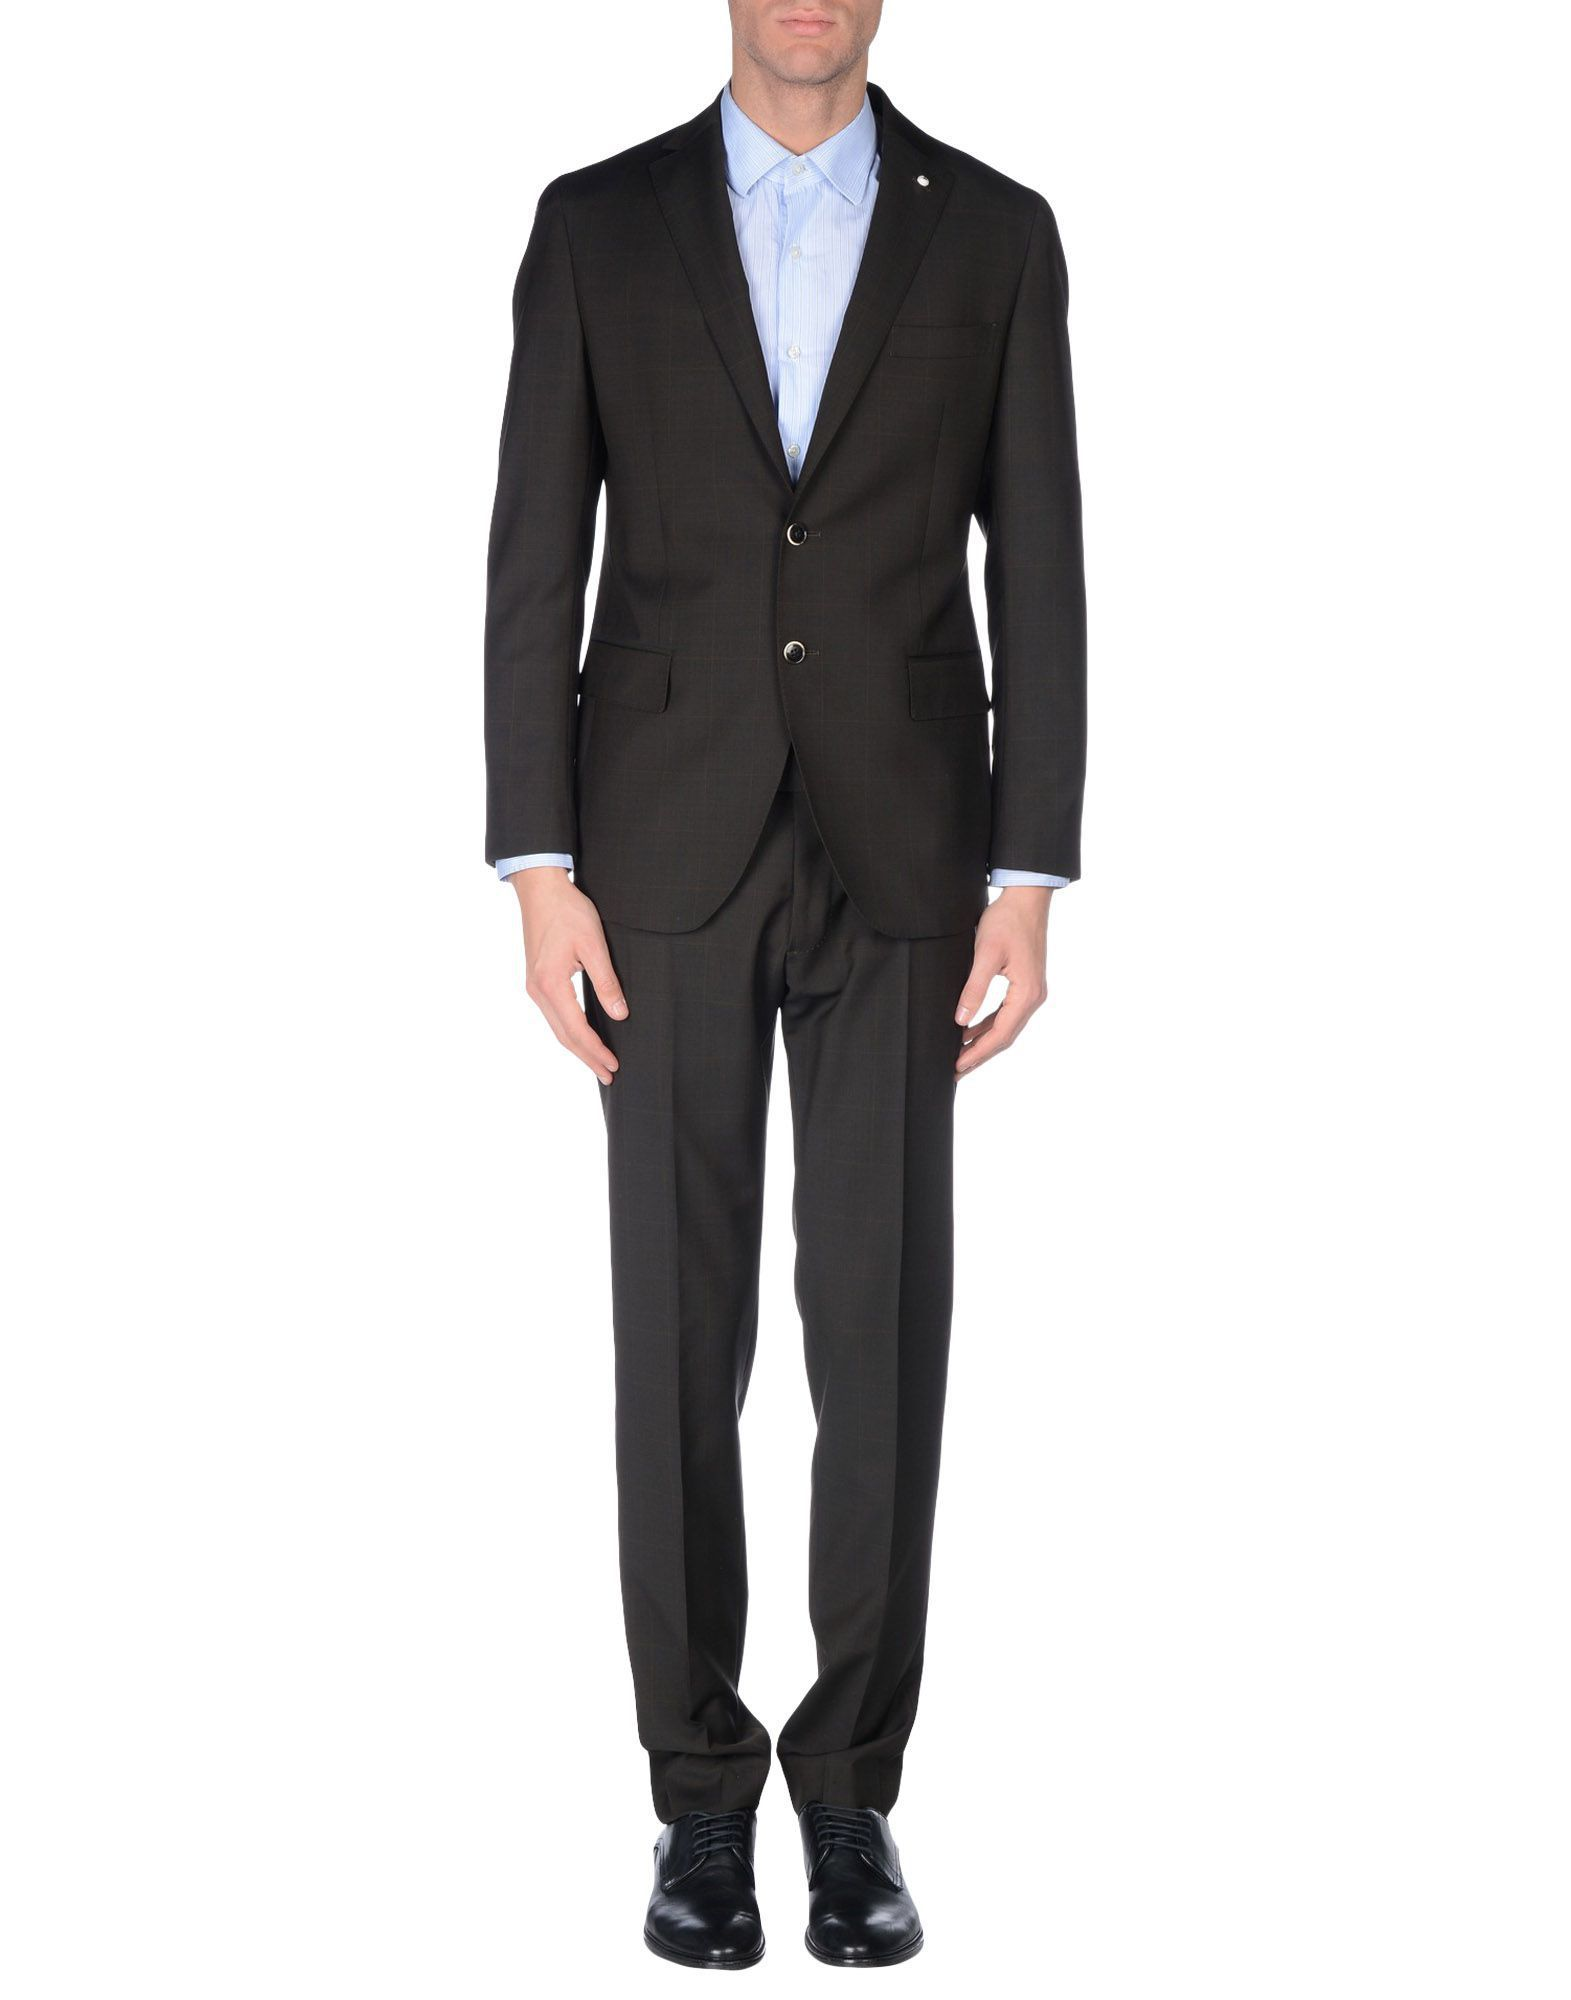 LUIGI BIANCHI MANTOVA ΚΟΣΤΟΥΜΙΑ ΚΑΙ ΣΑΚΑΚΙΑ Κοστούμι #joy #style #fashion